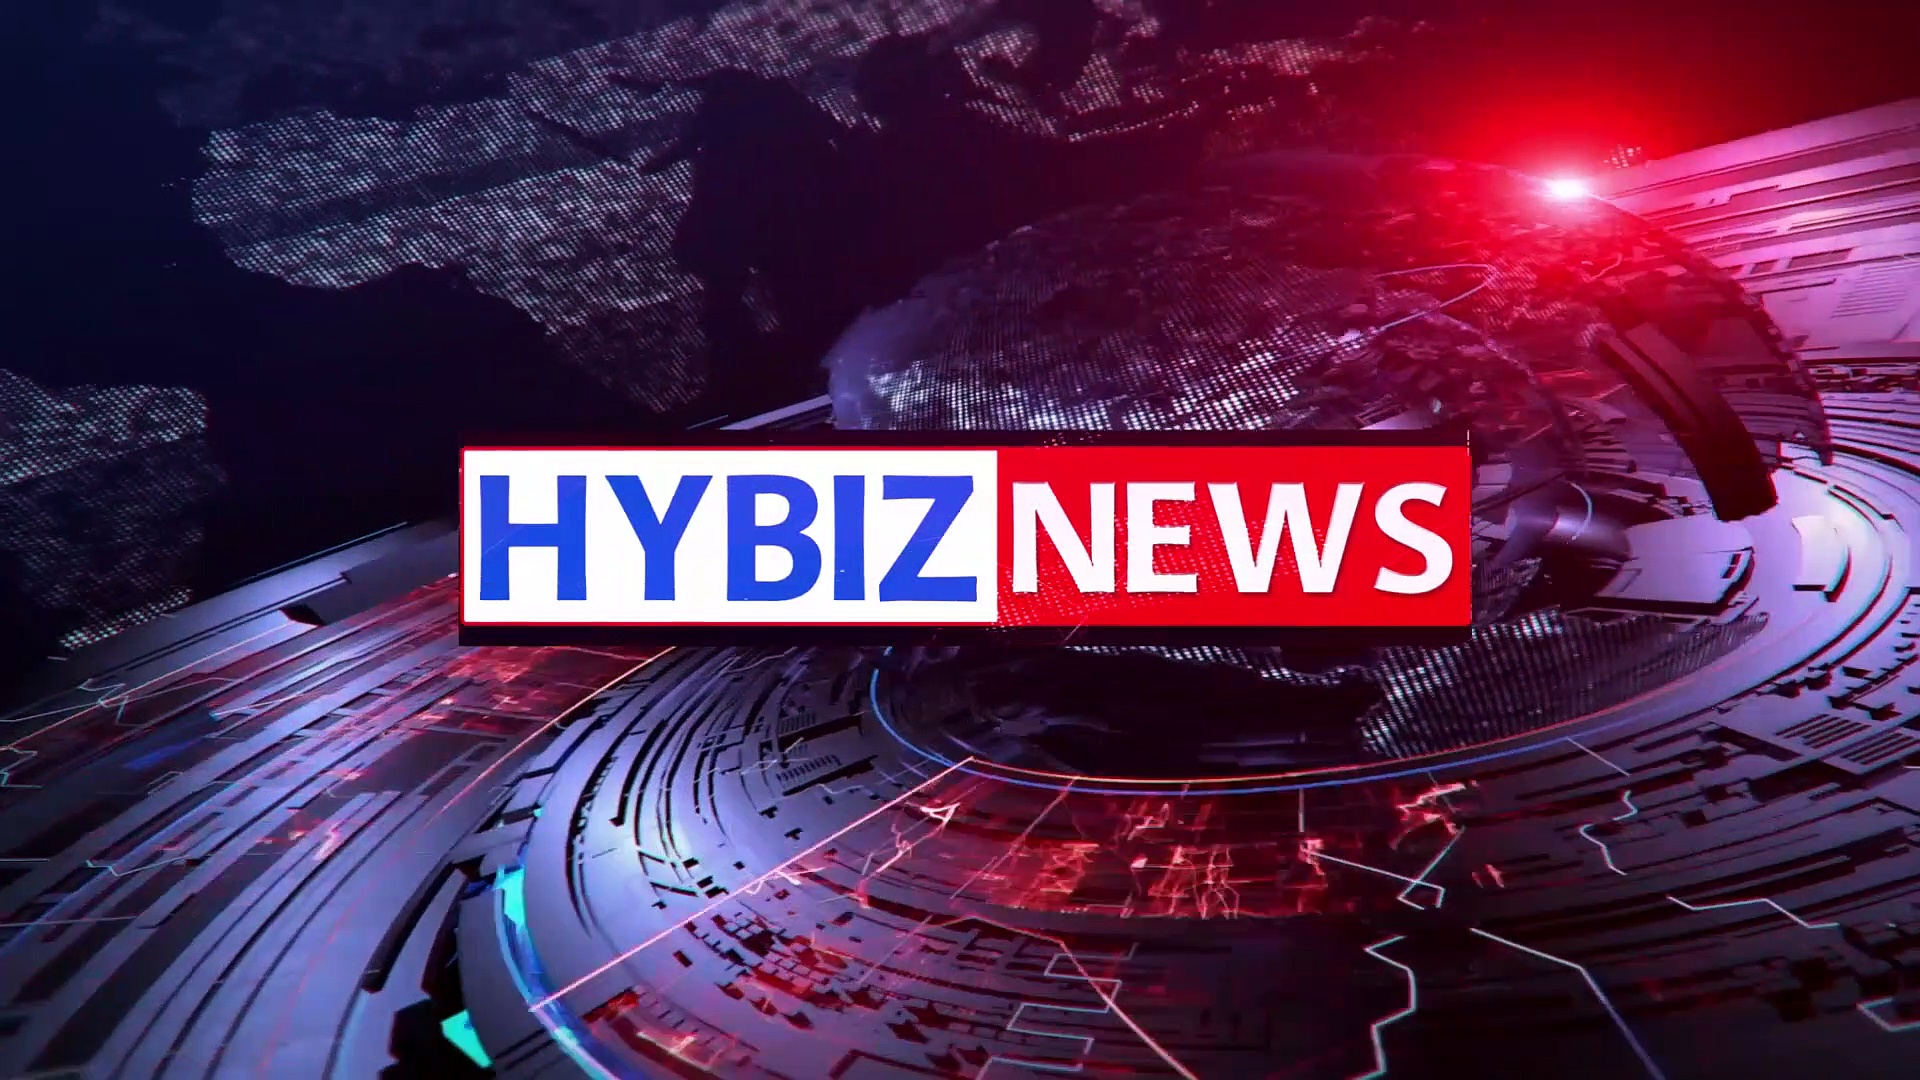 Novak Djokovic and Wife Jelena test positive for Covid-19 | hybiz news